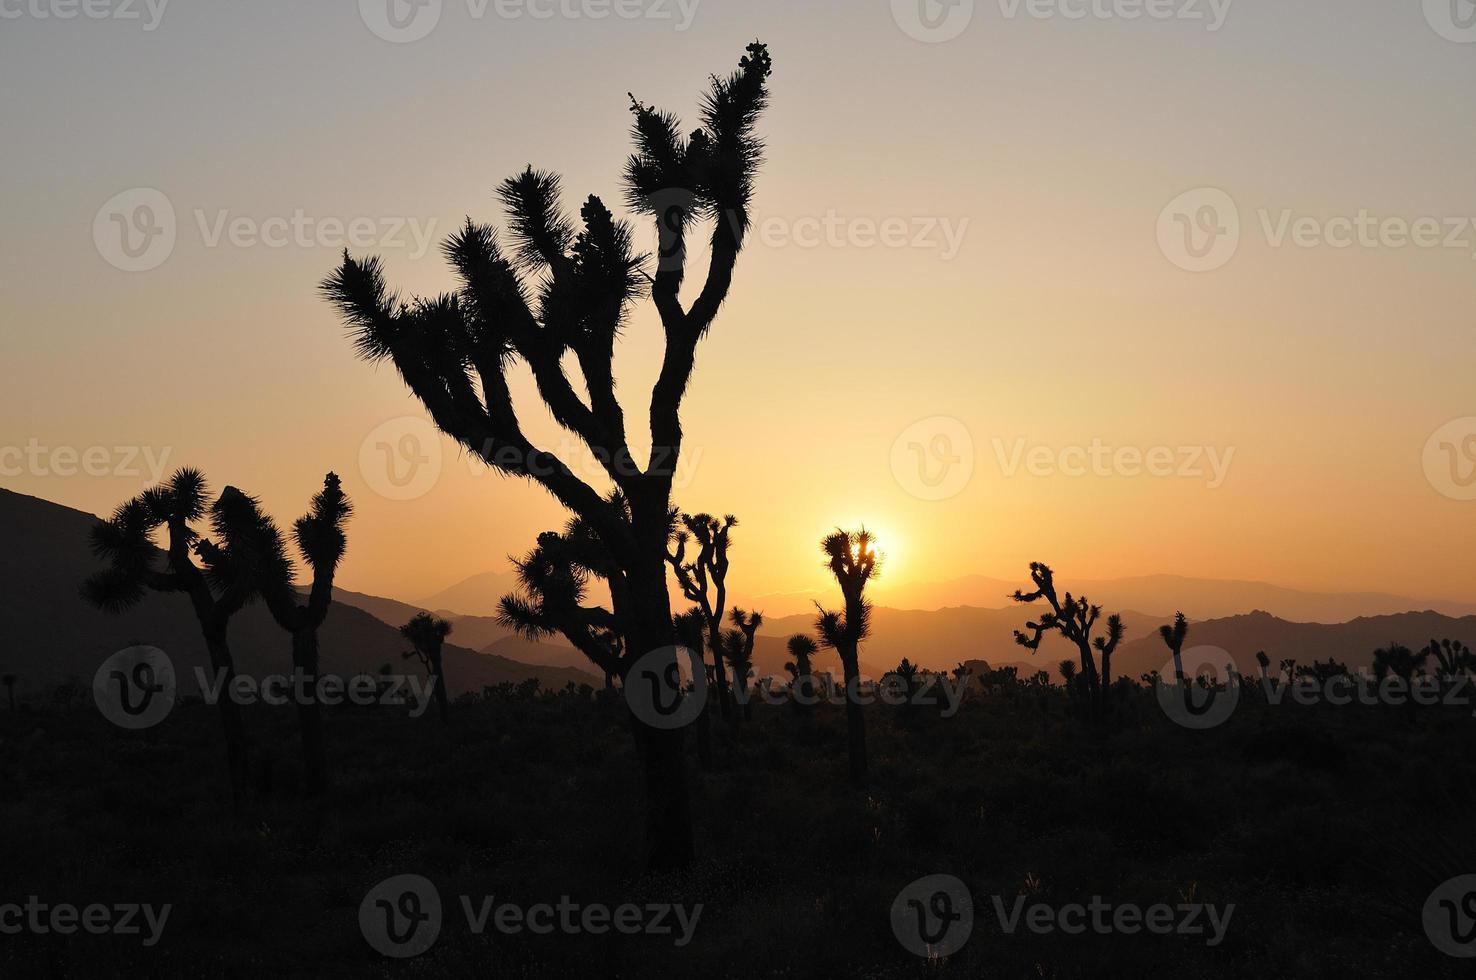 Sunset Joshua Tree photo